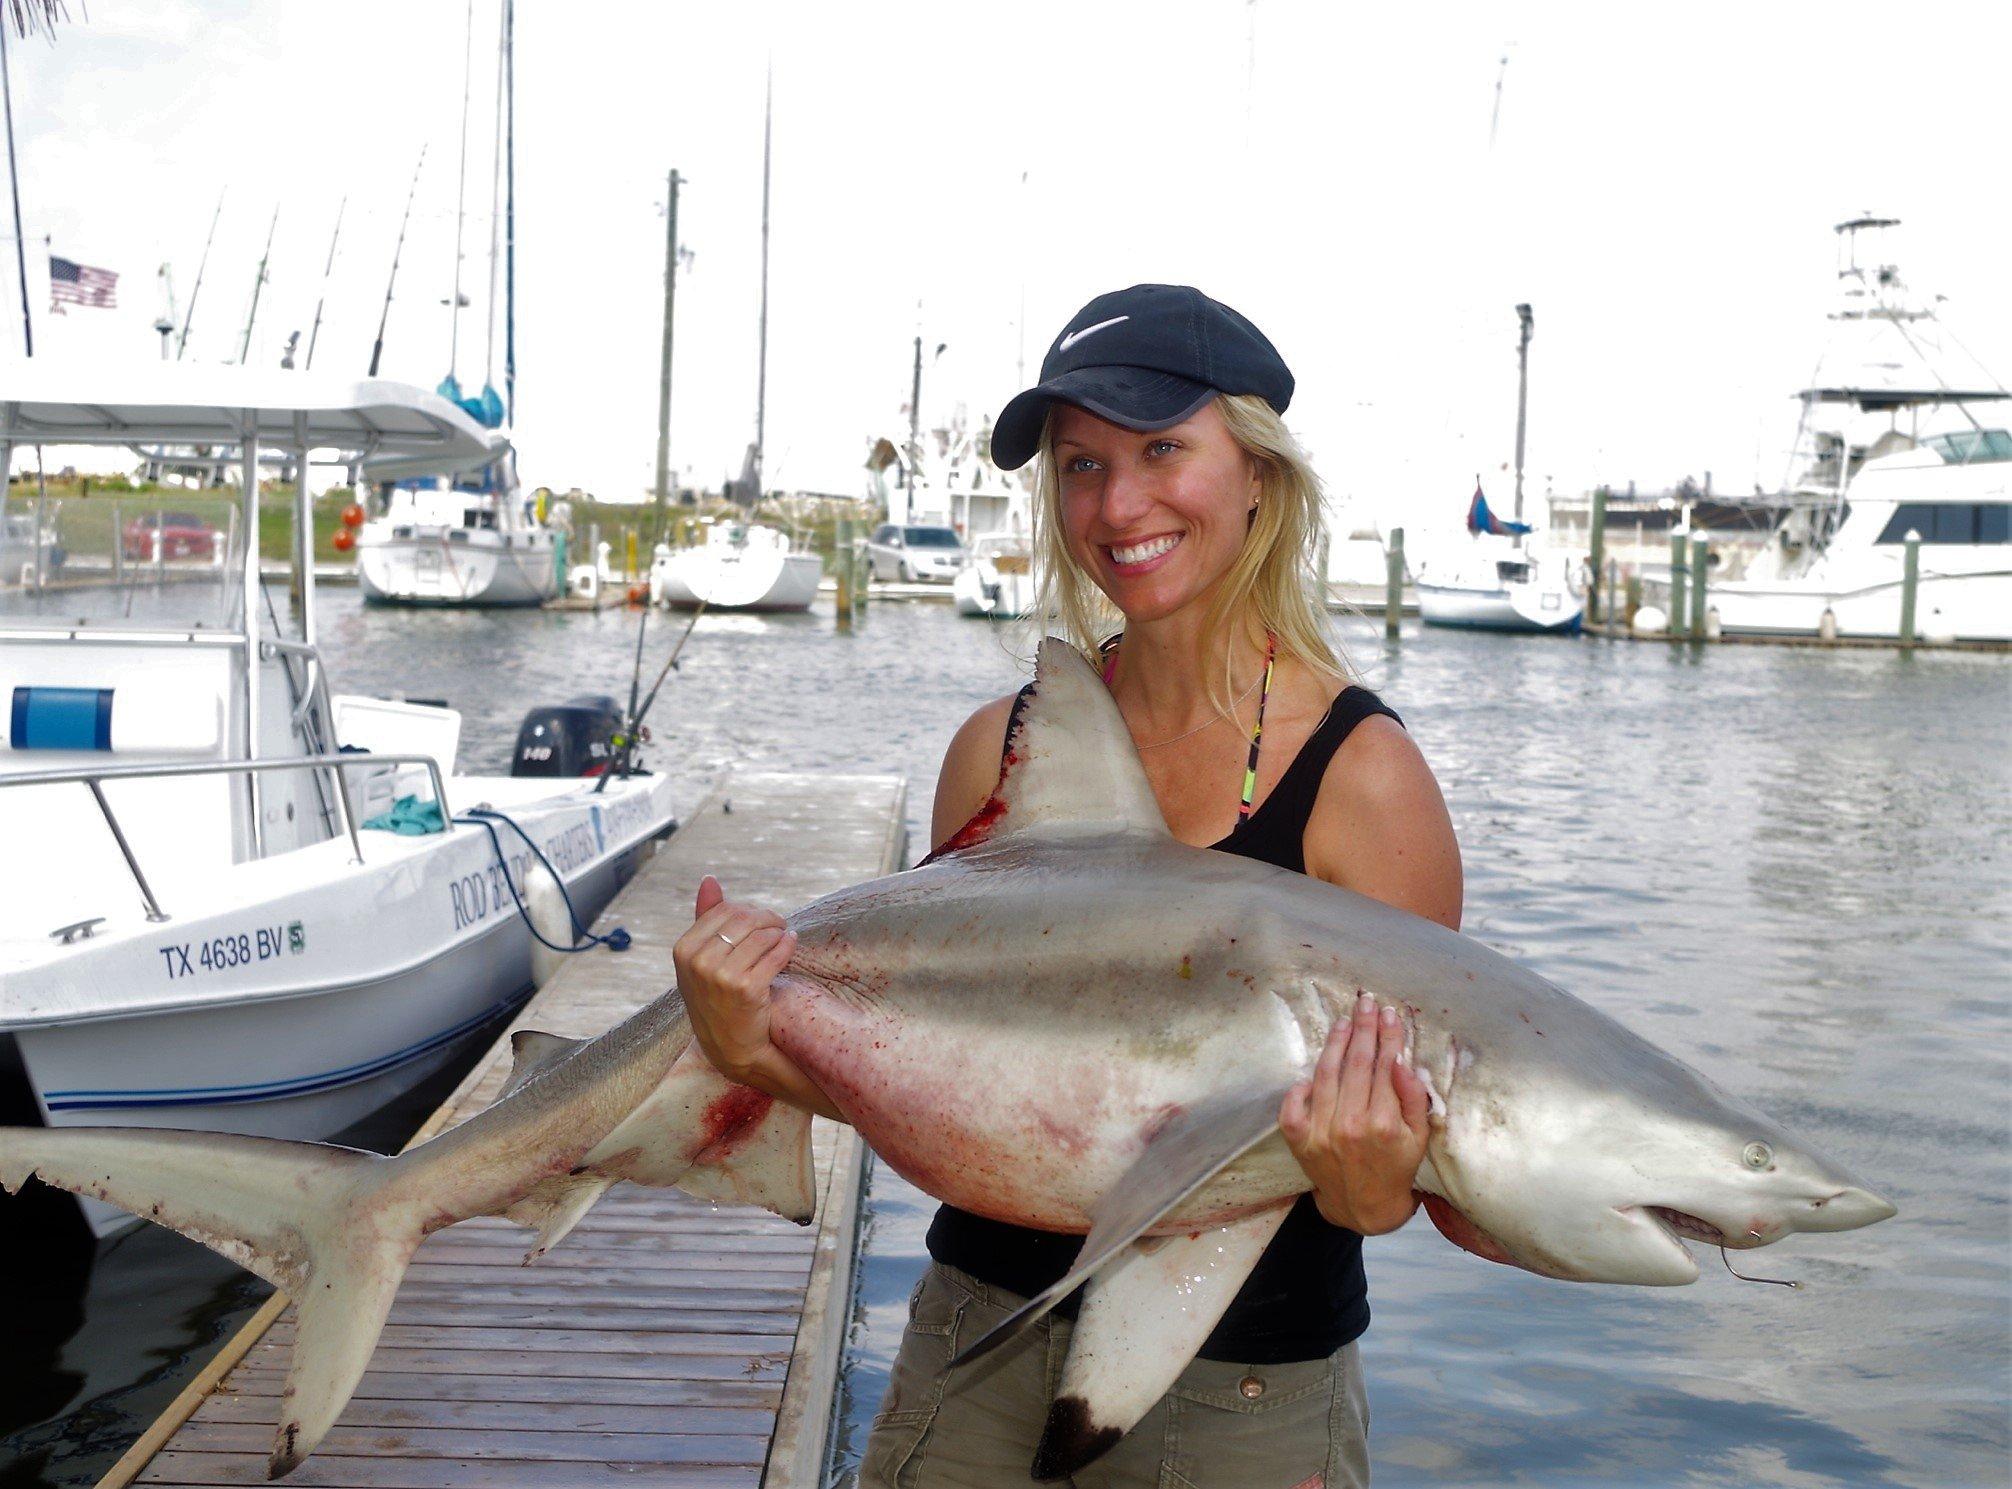 https://0201.nccdn.net/1_2/000/000/0aa/42b/shark-fishing-galveston-fishing-charters.jpg